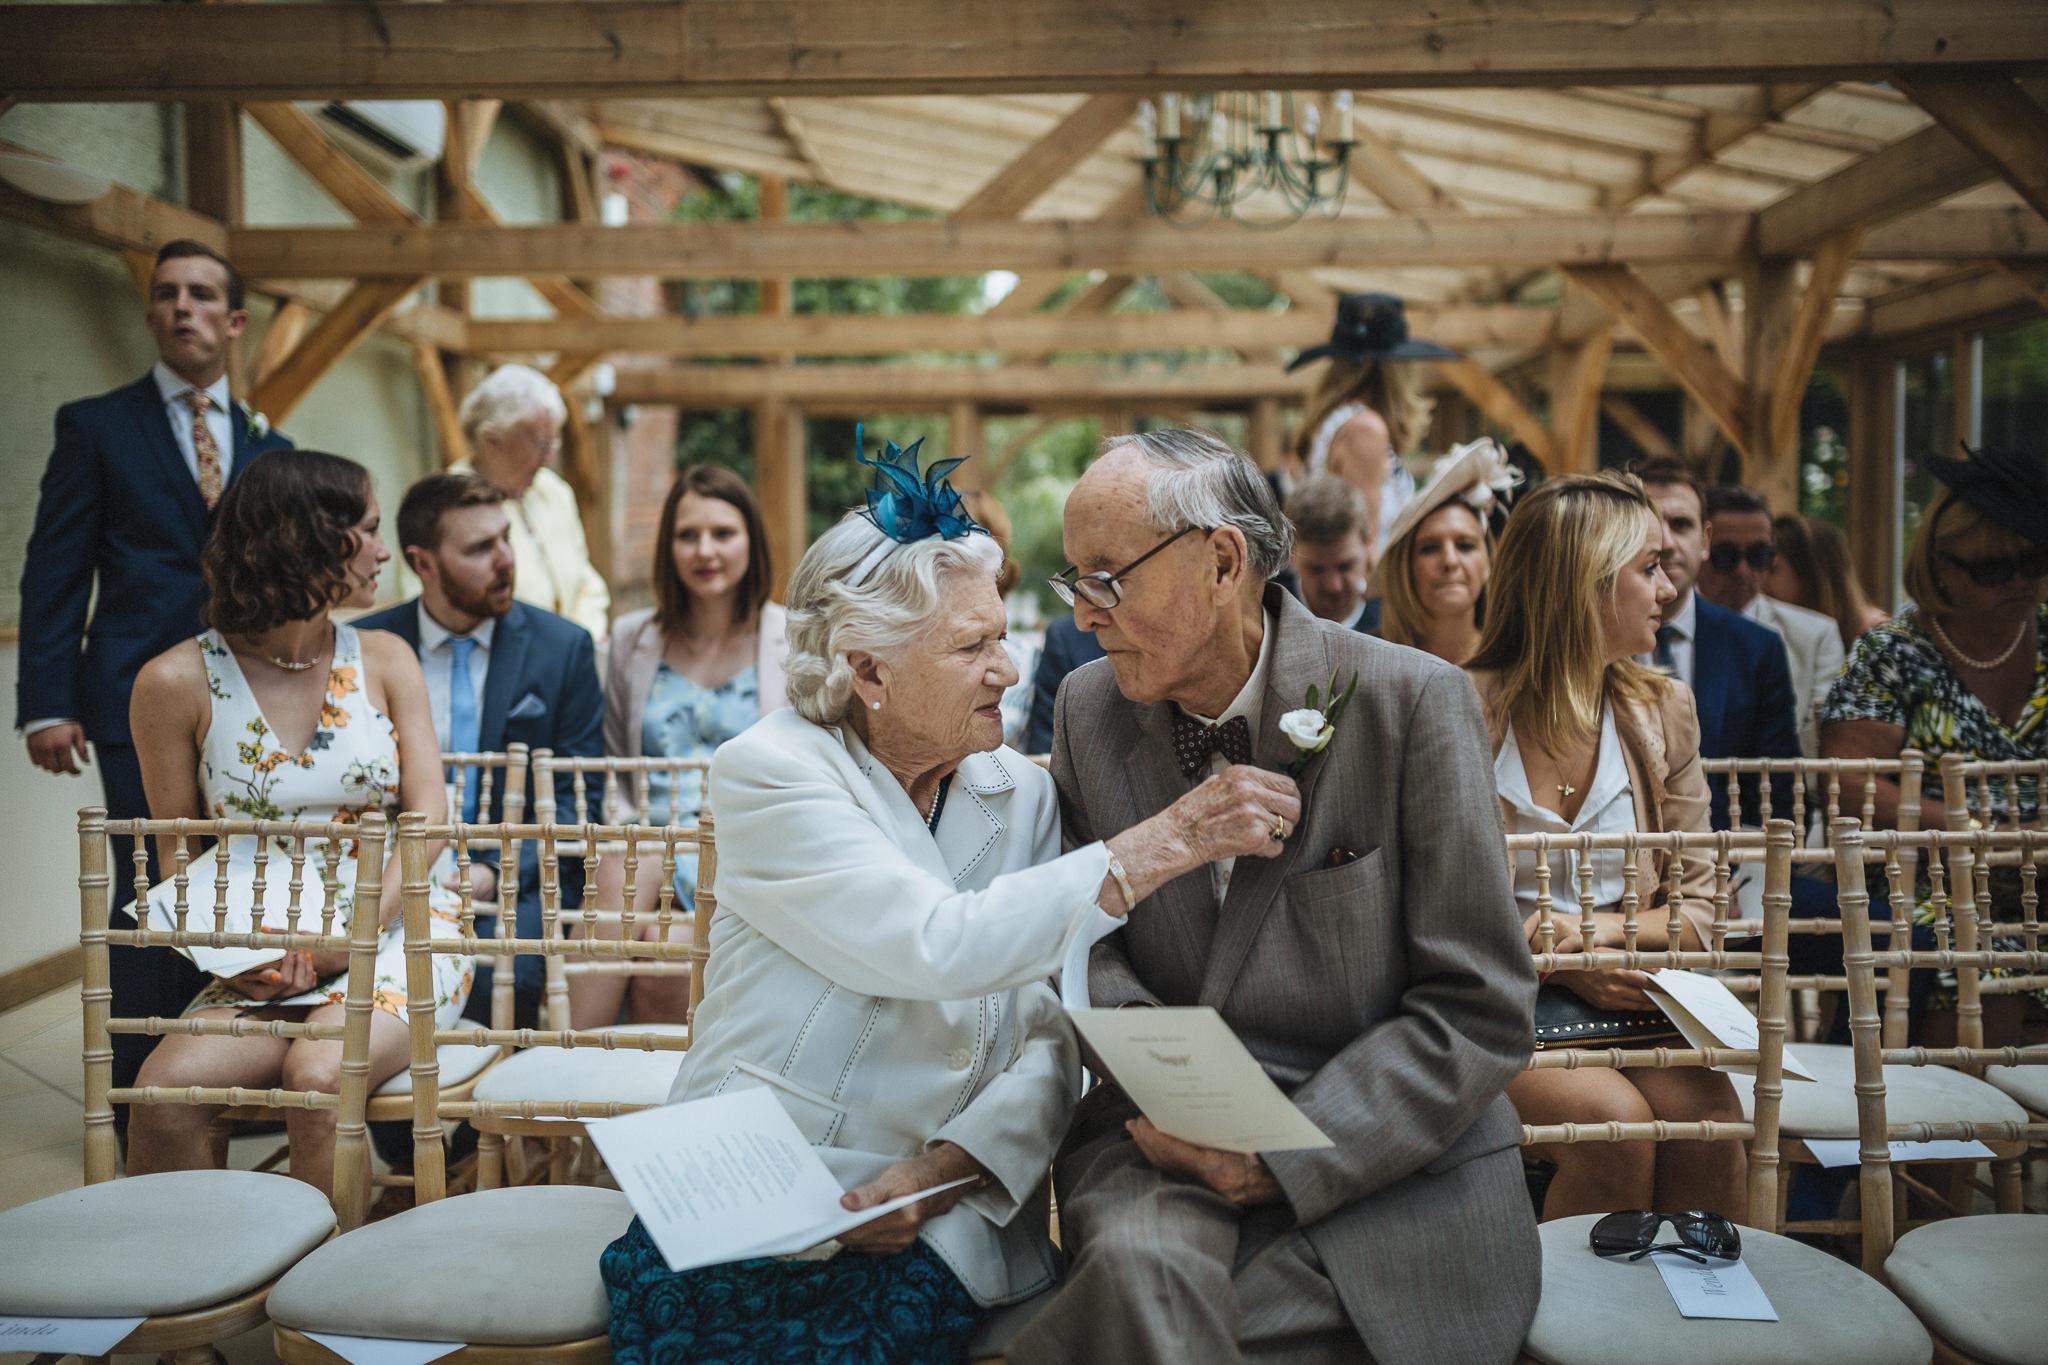 paul-marbrook-Gaynes-Park Wedding-Photographer-90030